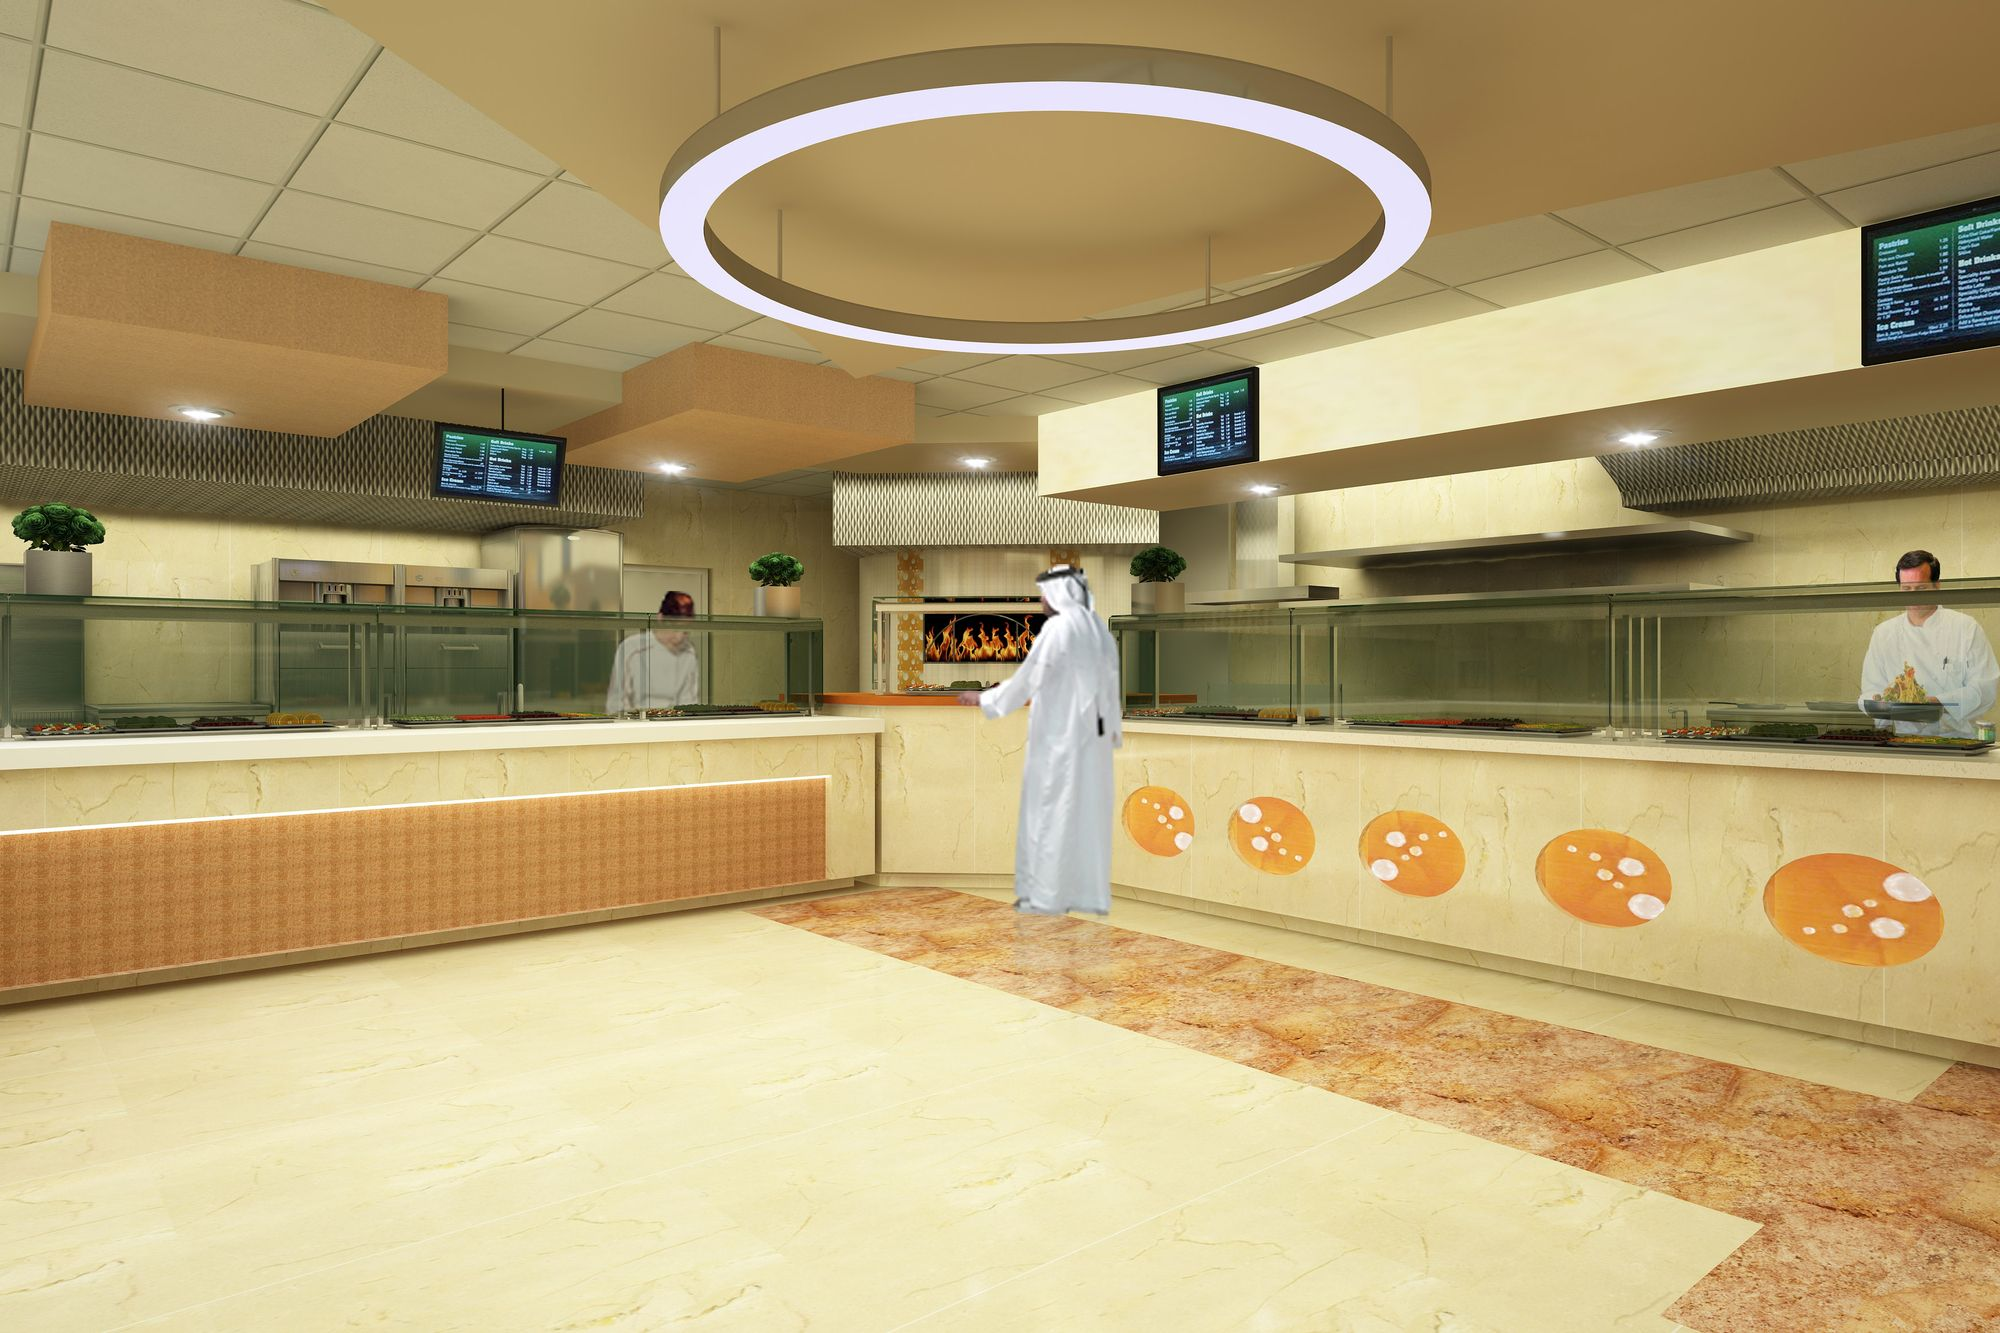 Food service station